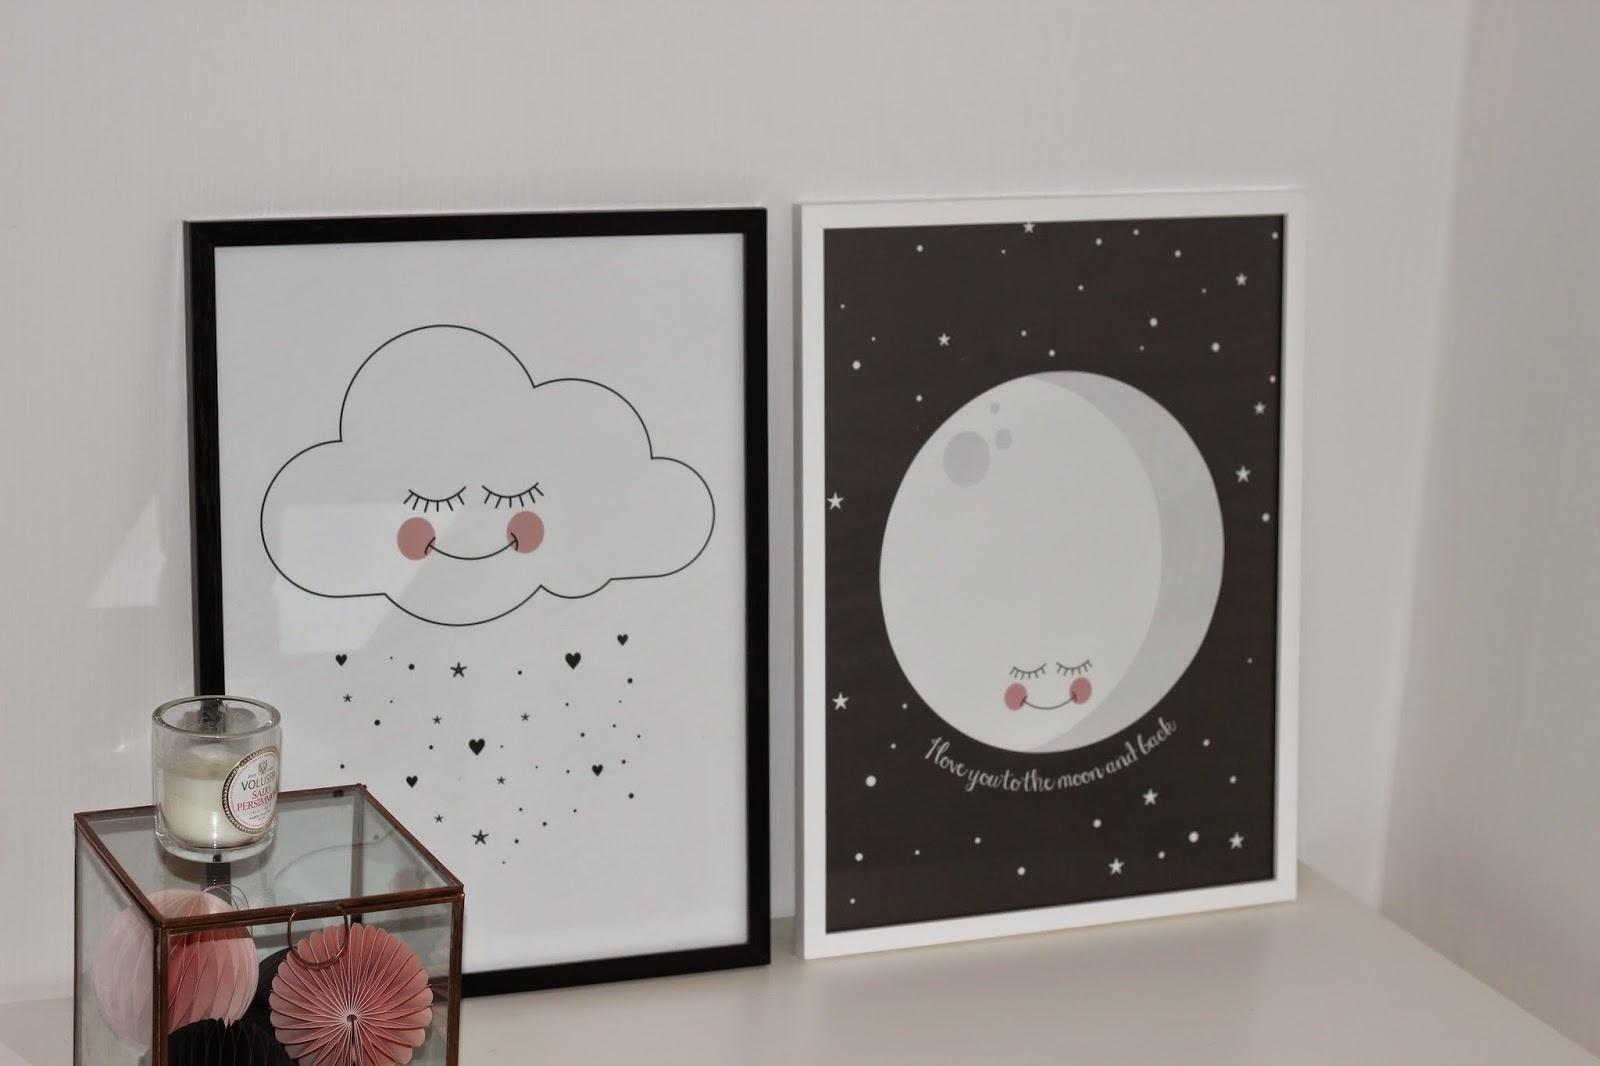 Snygga prints